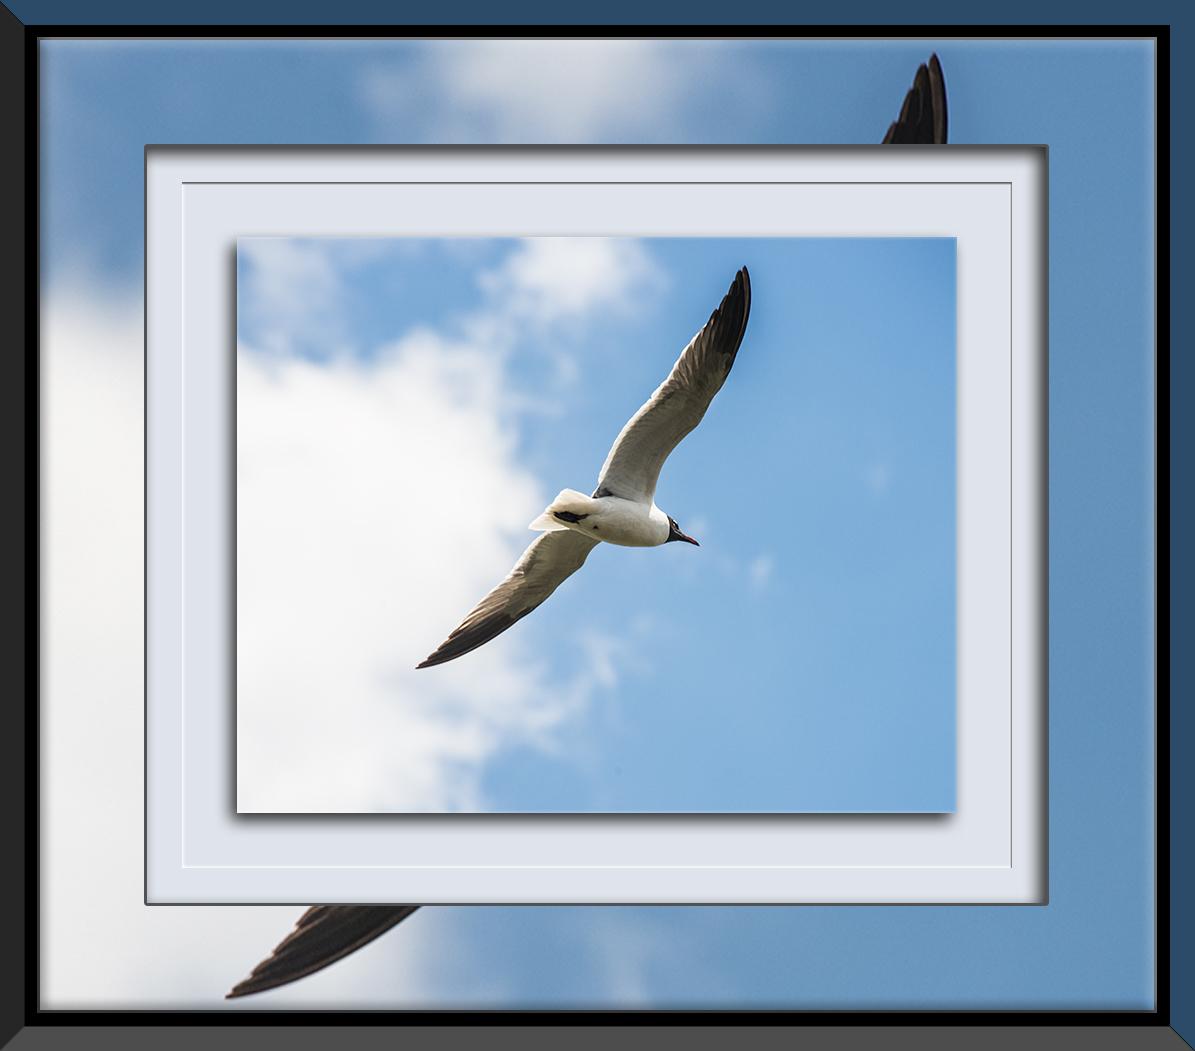 Sea Gull_2015 05 03_0490 blog